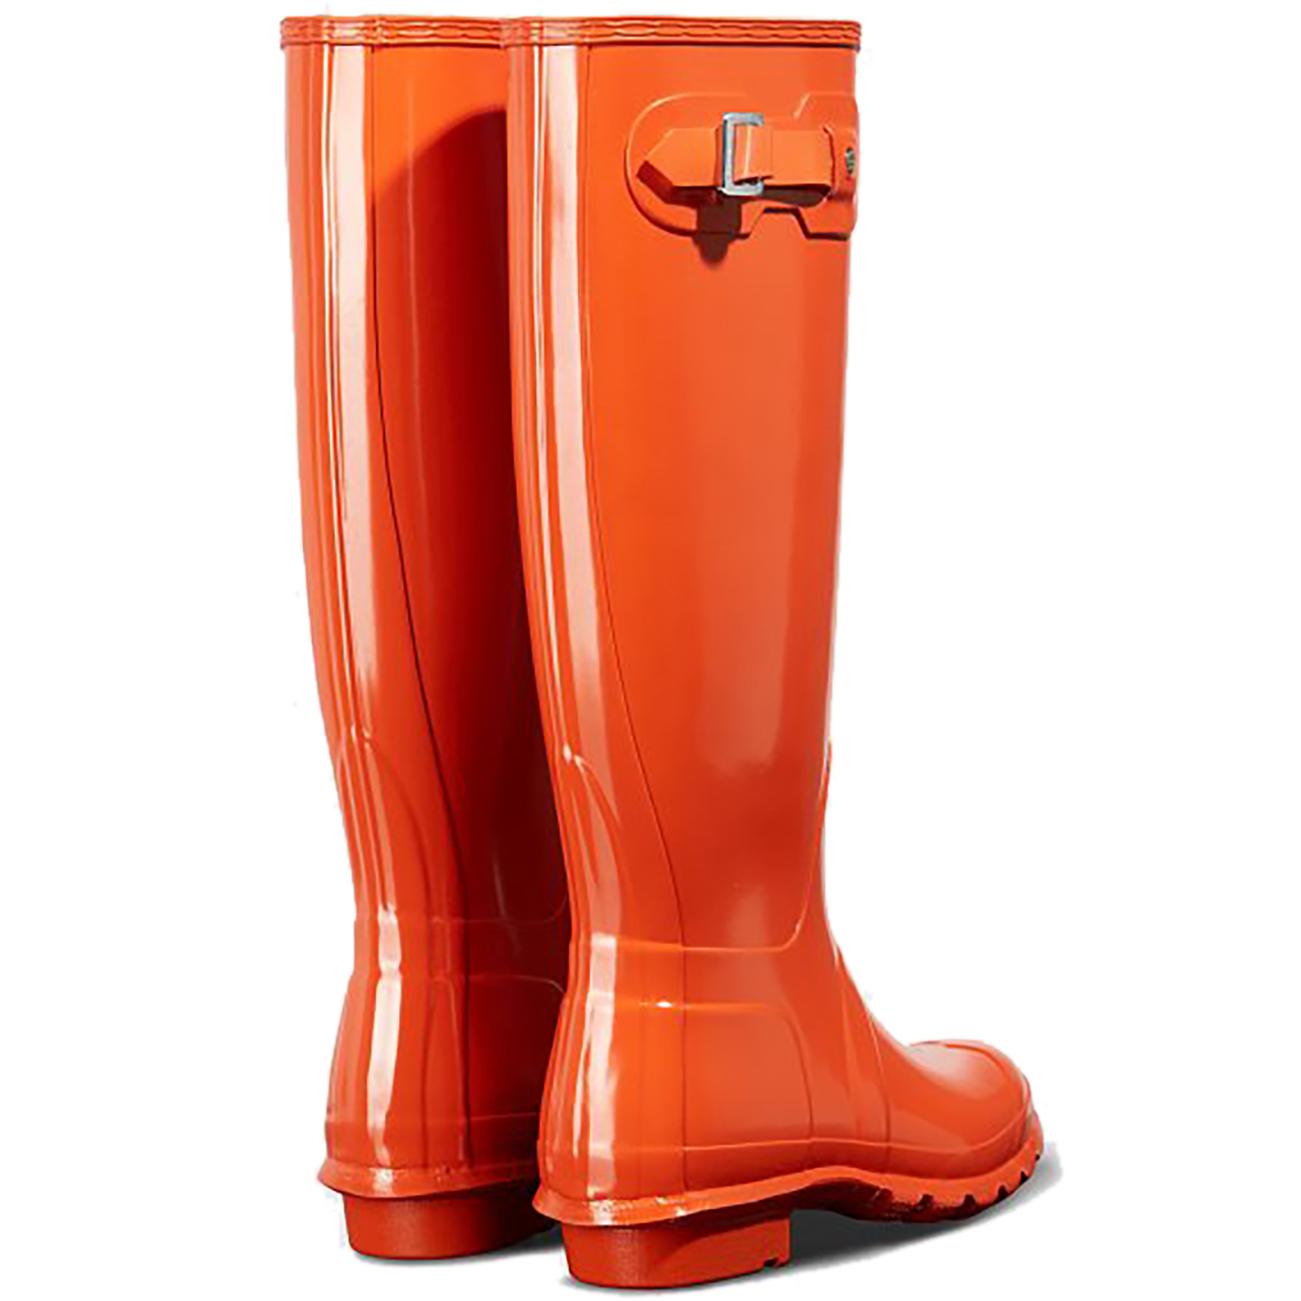 481f8dcdda96 Womens Hunter Original Tall Gloss Waterproof Rubber Rain Boot ...